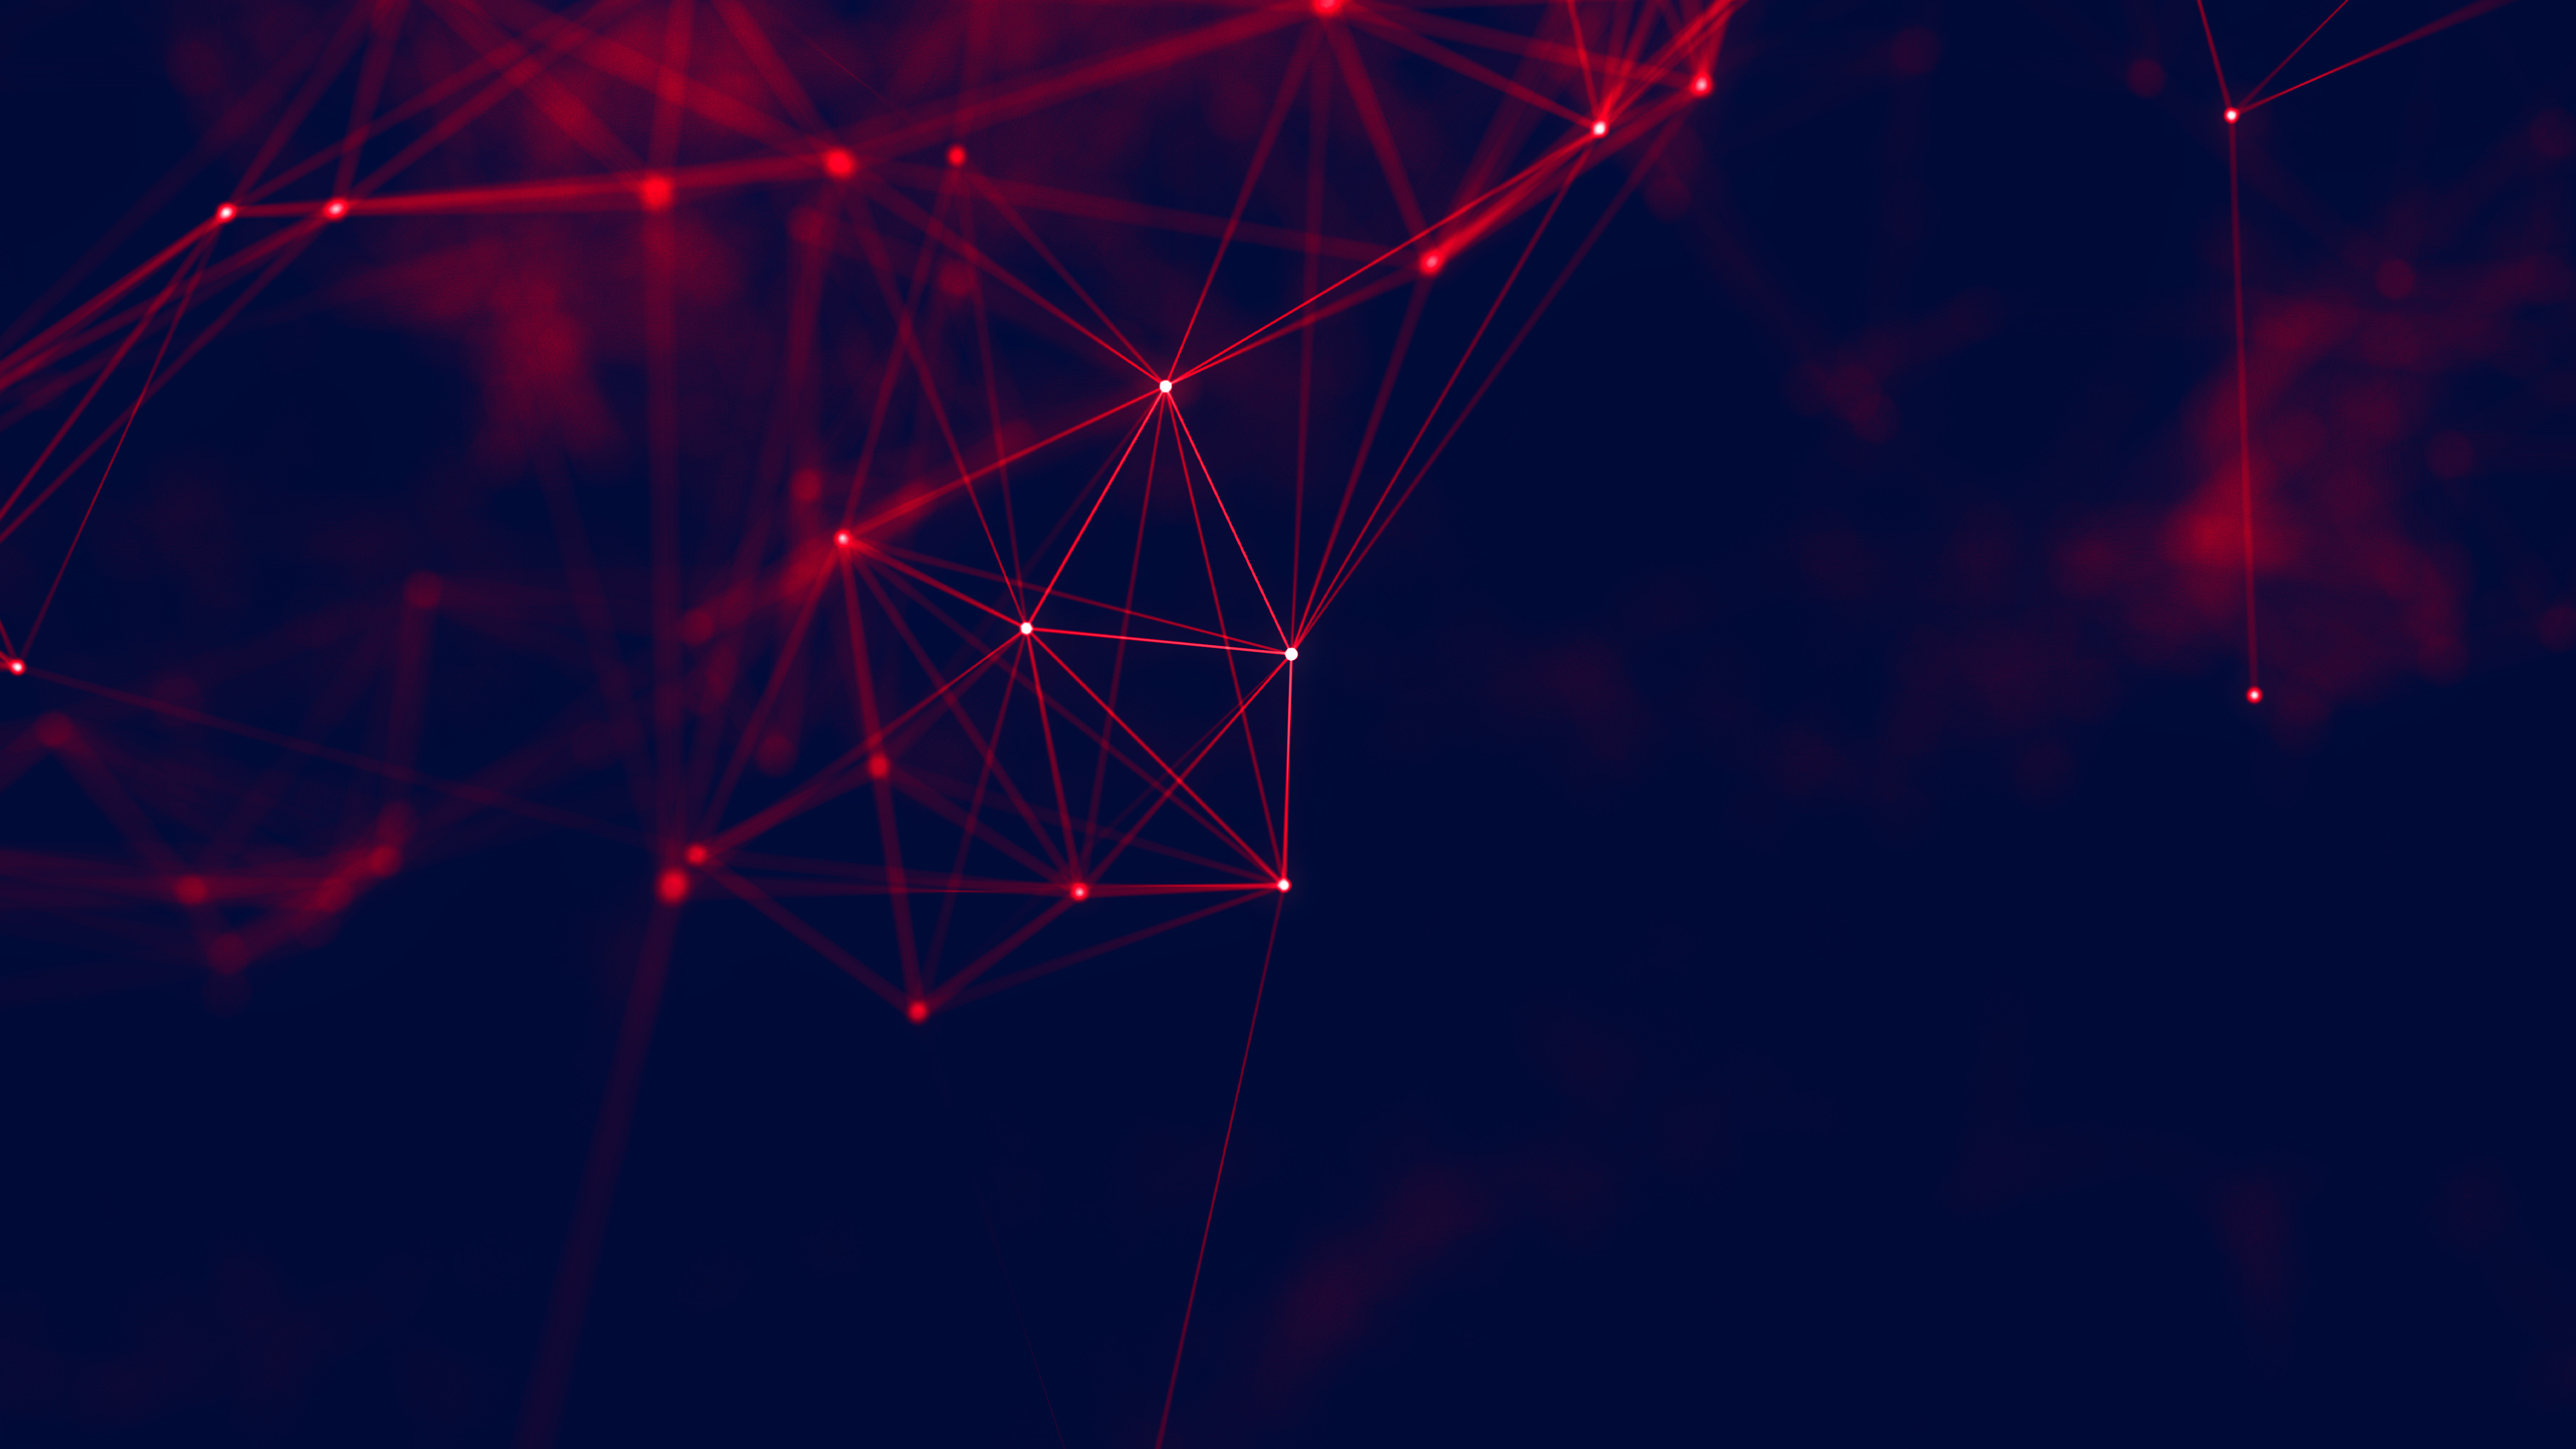 General 6080x3420 geometry cyberspace red lines digital art abstract vector